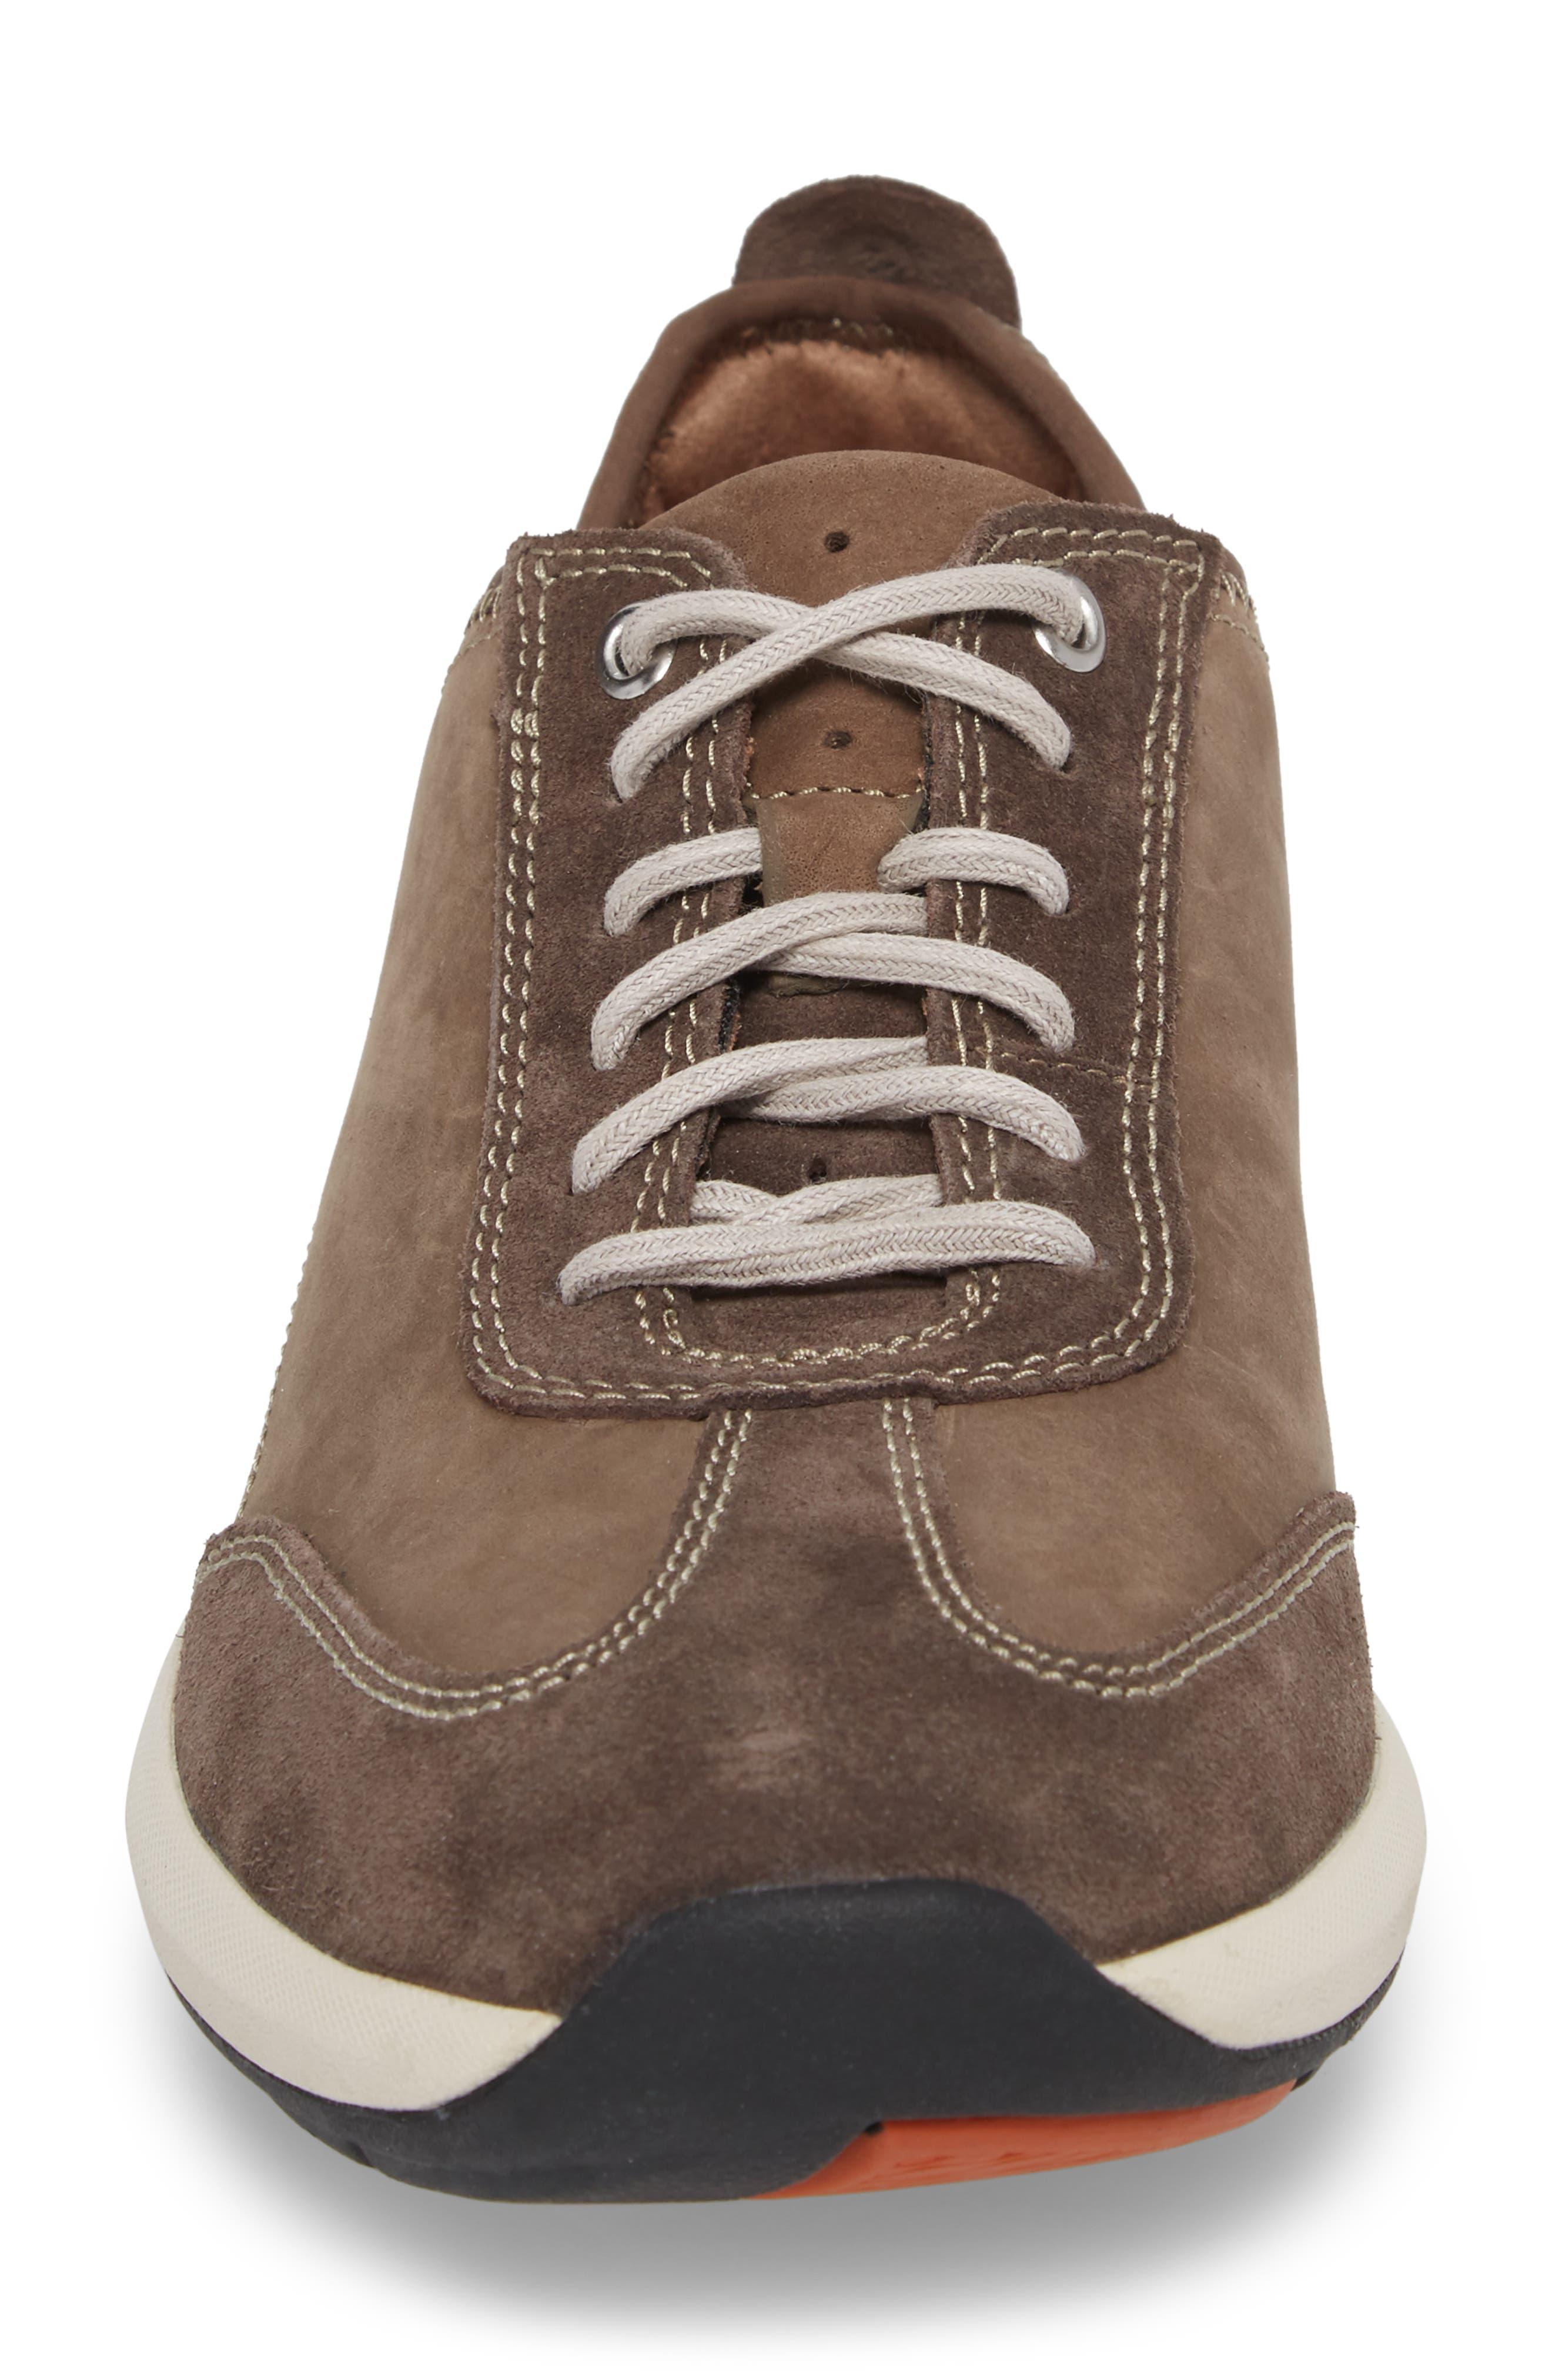 Clarks<sup>®</sup> Un Coast Low Top Sneaker,                             Alternate thumbnail 4, color,                             Taupe Nubuck